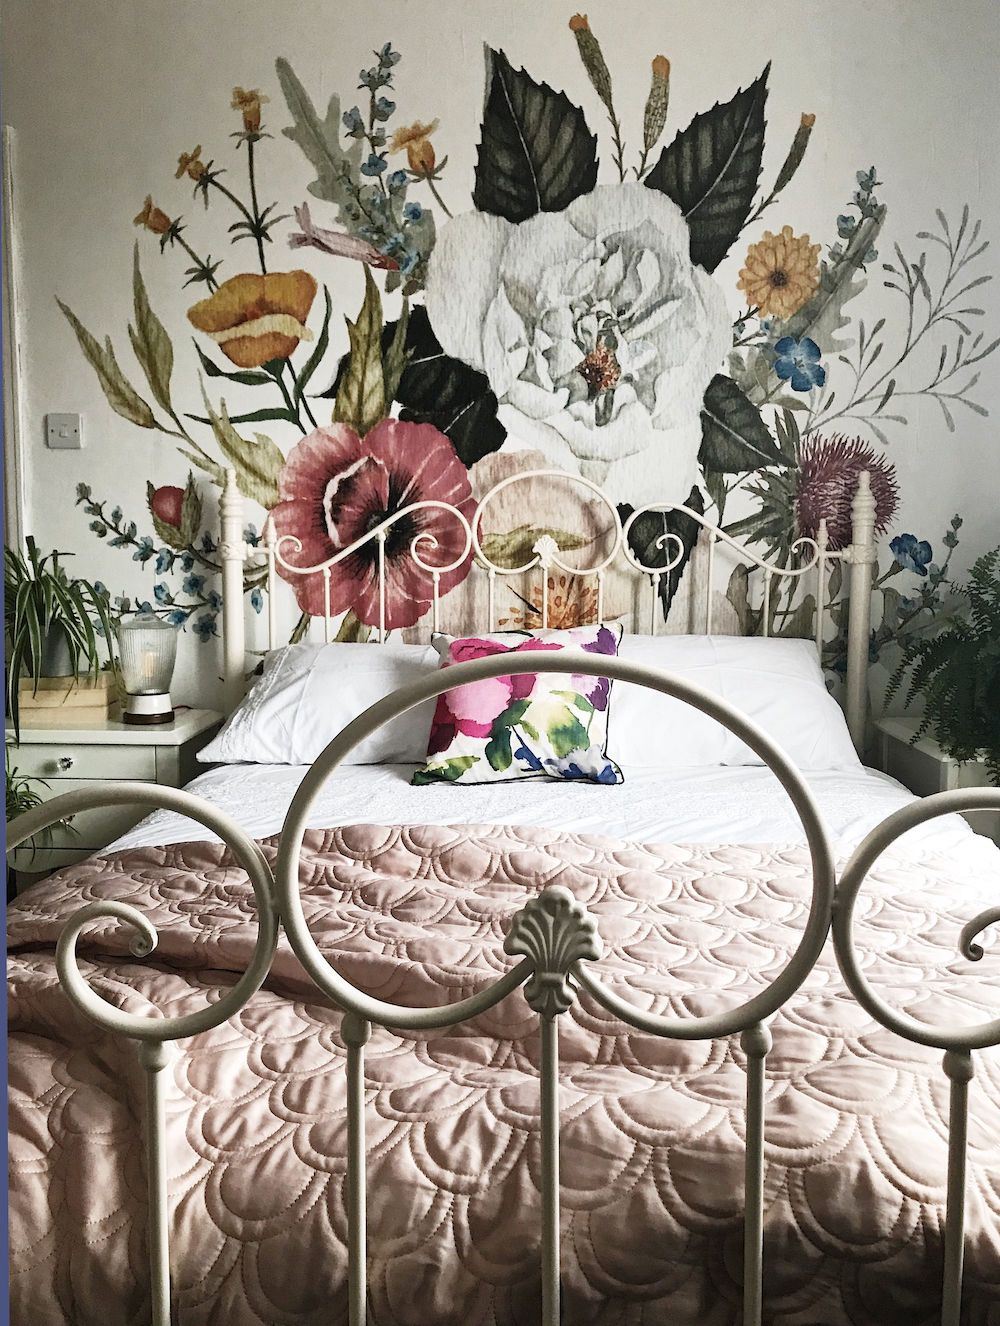 Floral wall mural via anewall